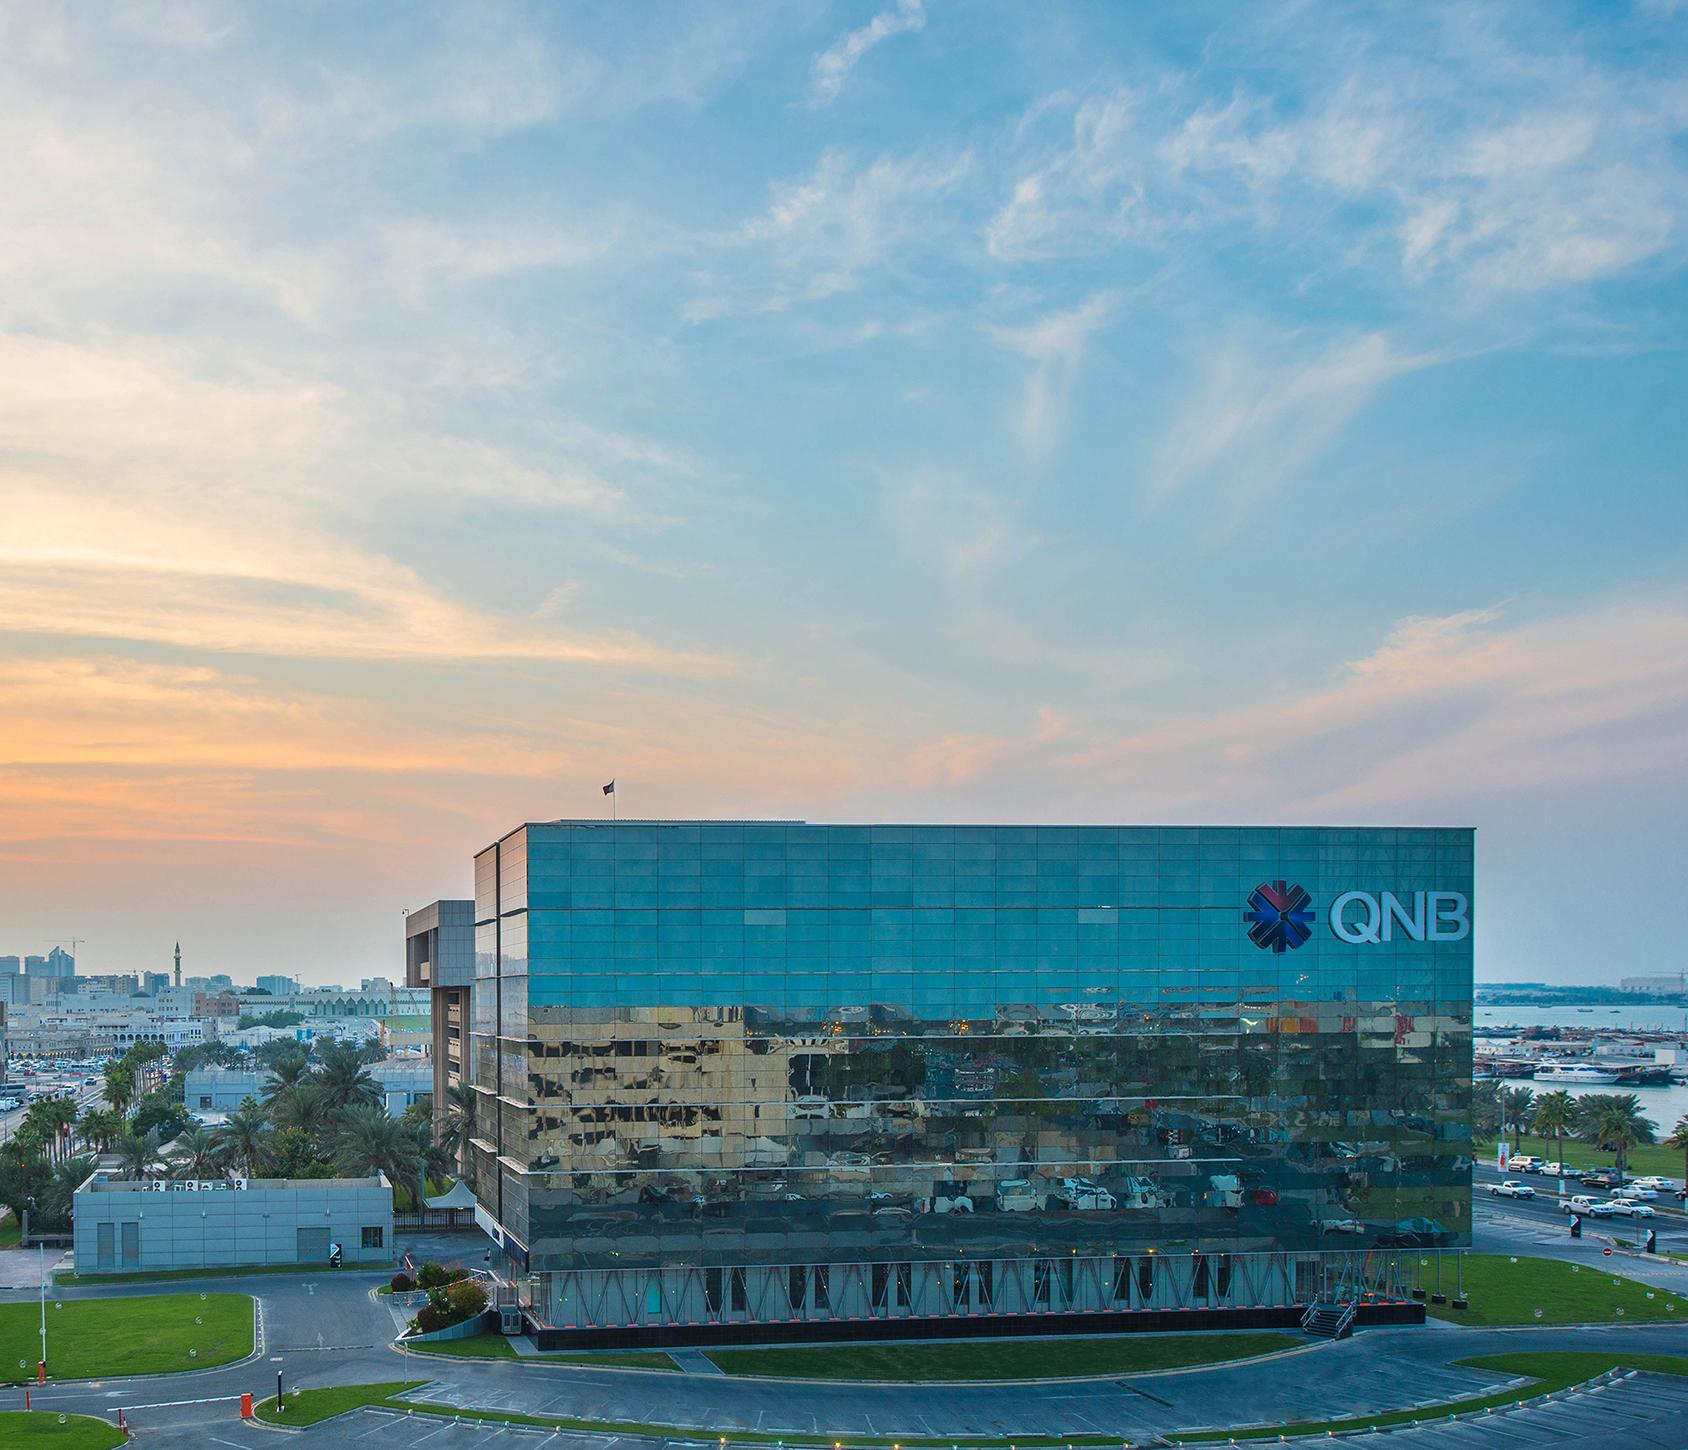 QNB Head office in Doha Qatar (Photo: ME NewsWire)